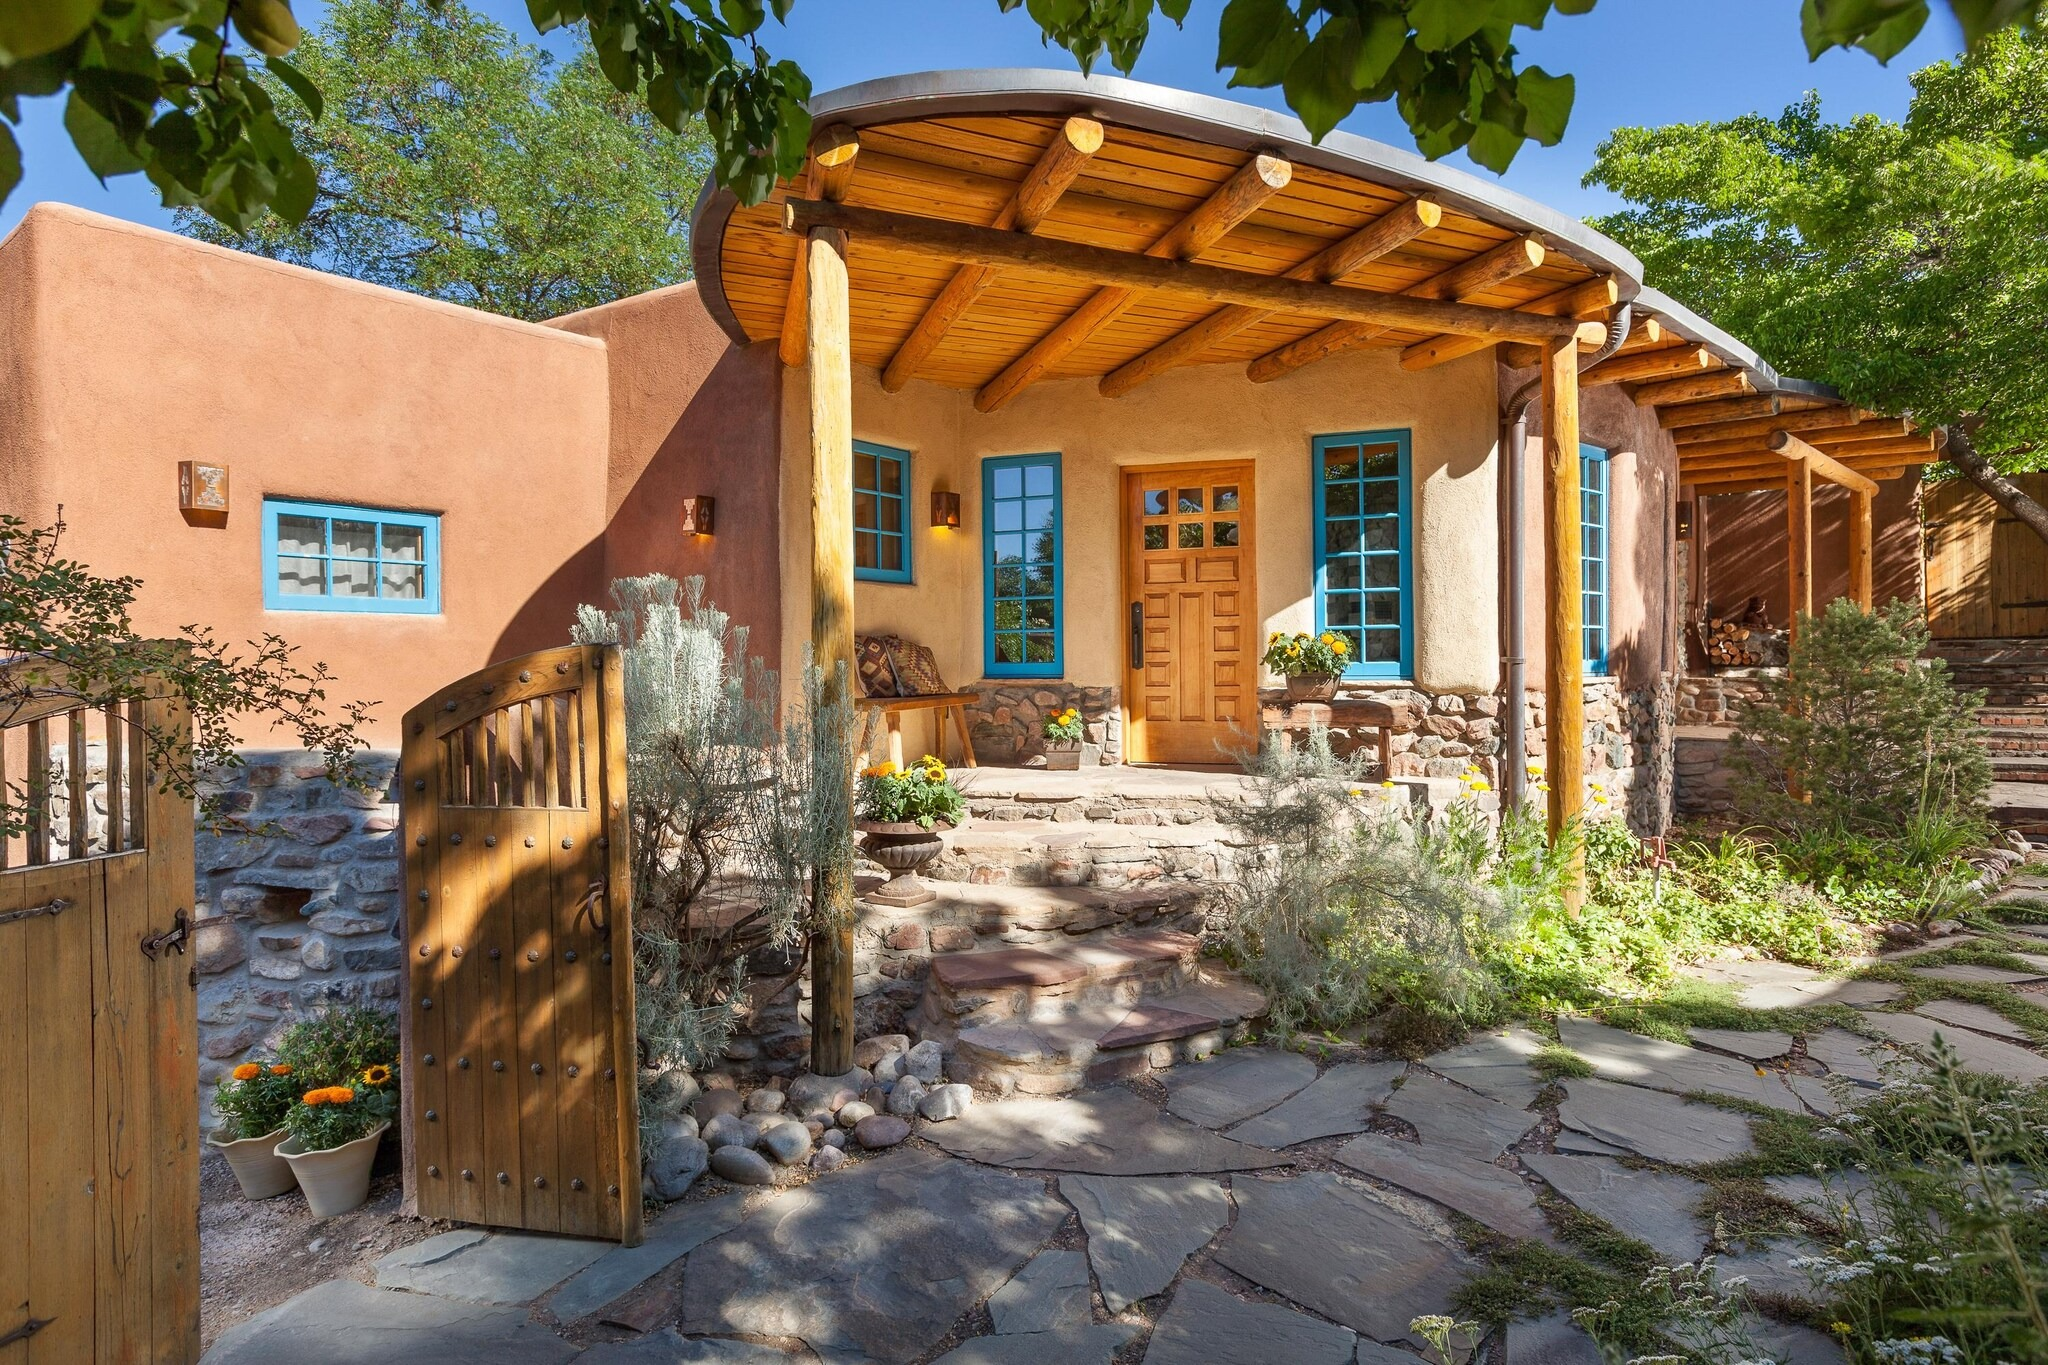 Rare and Restored Home in Santa Fe, New Mexico